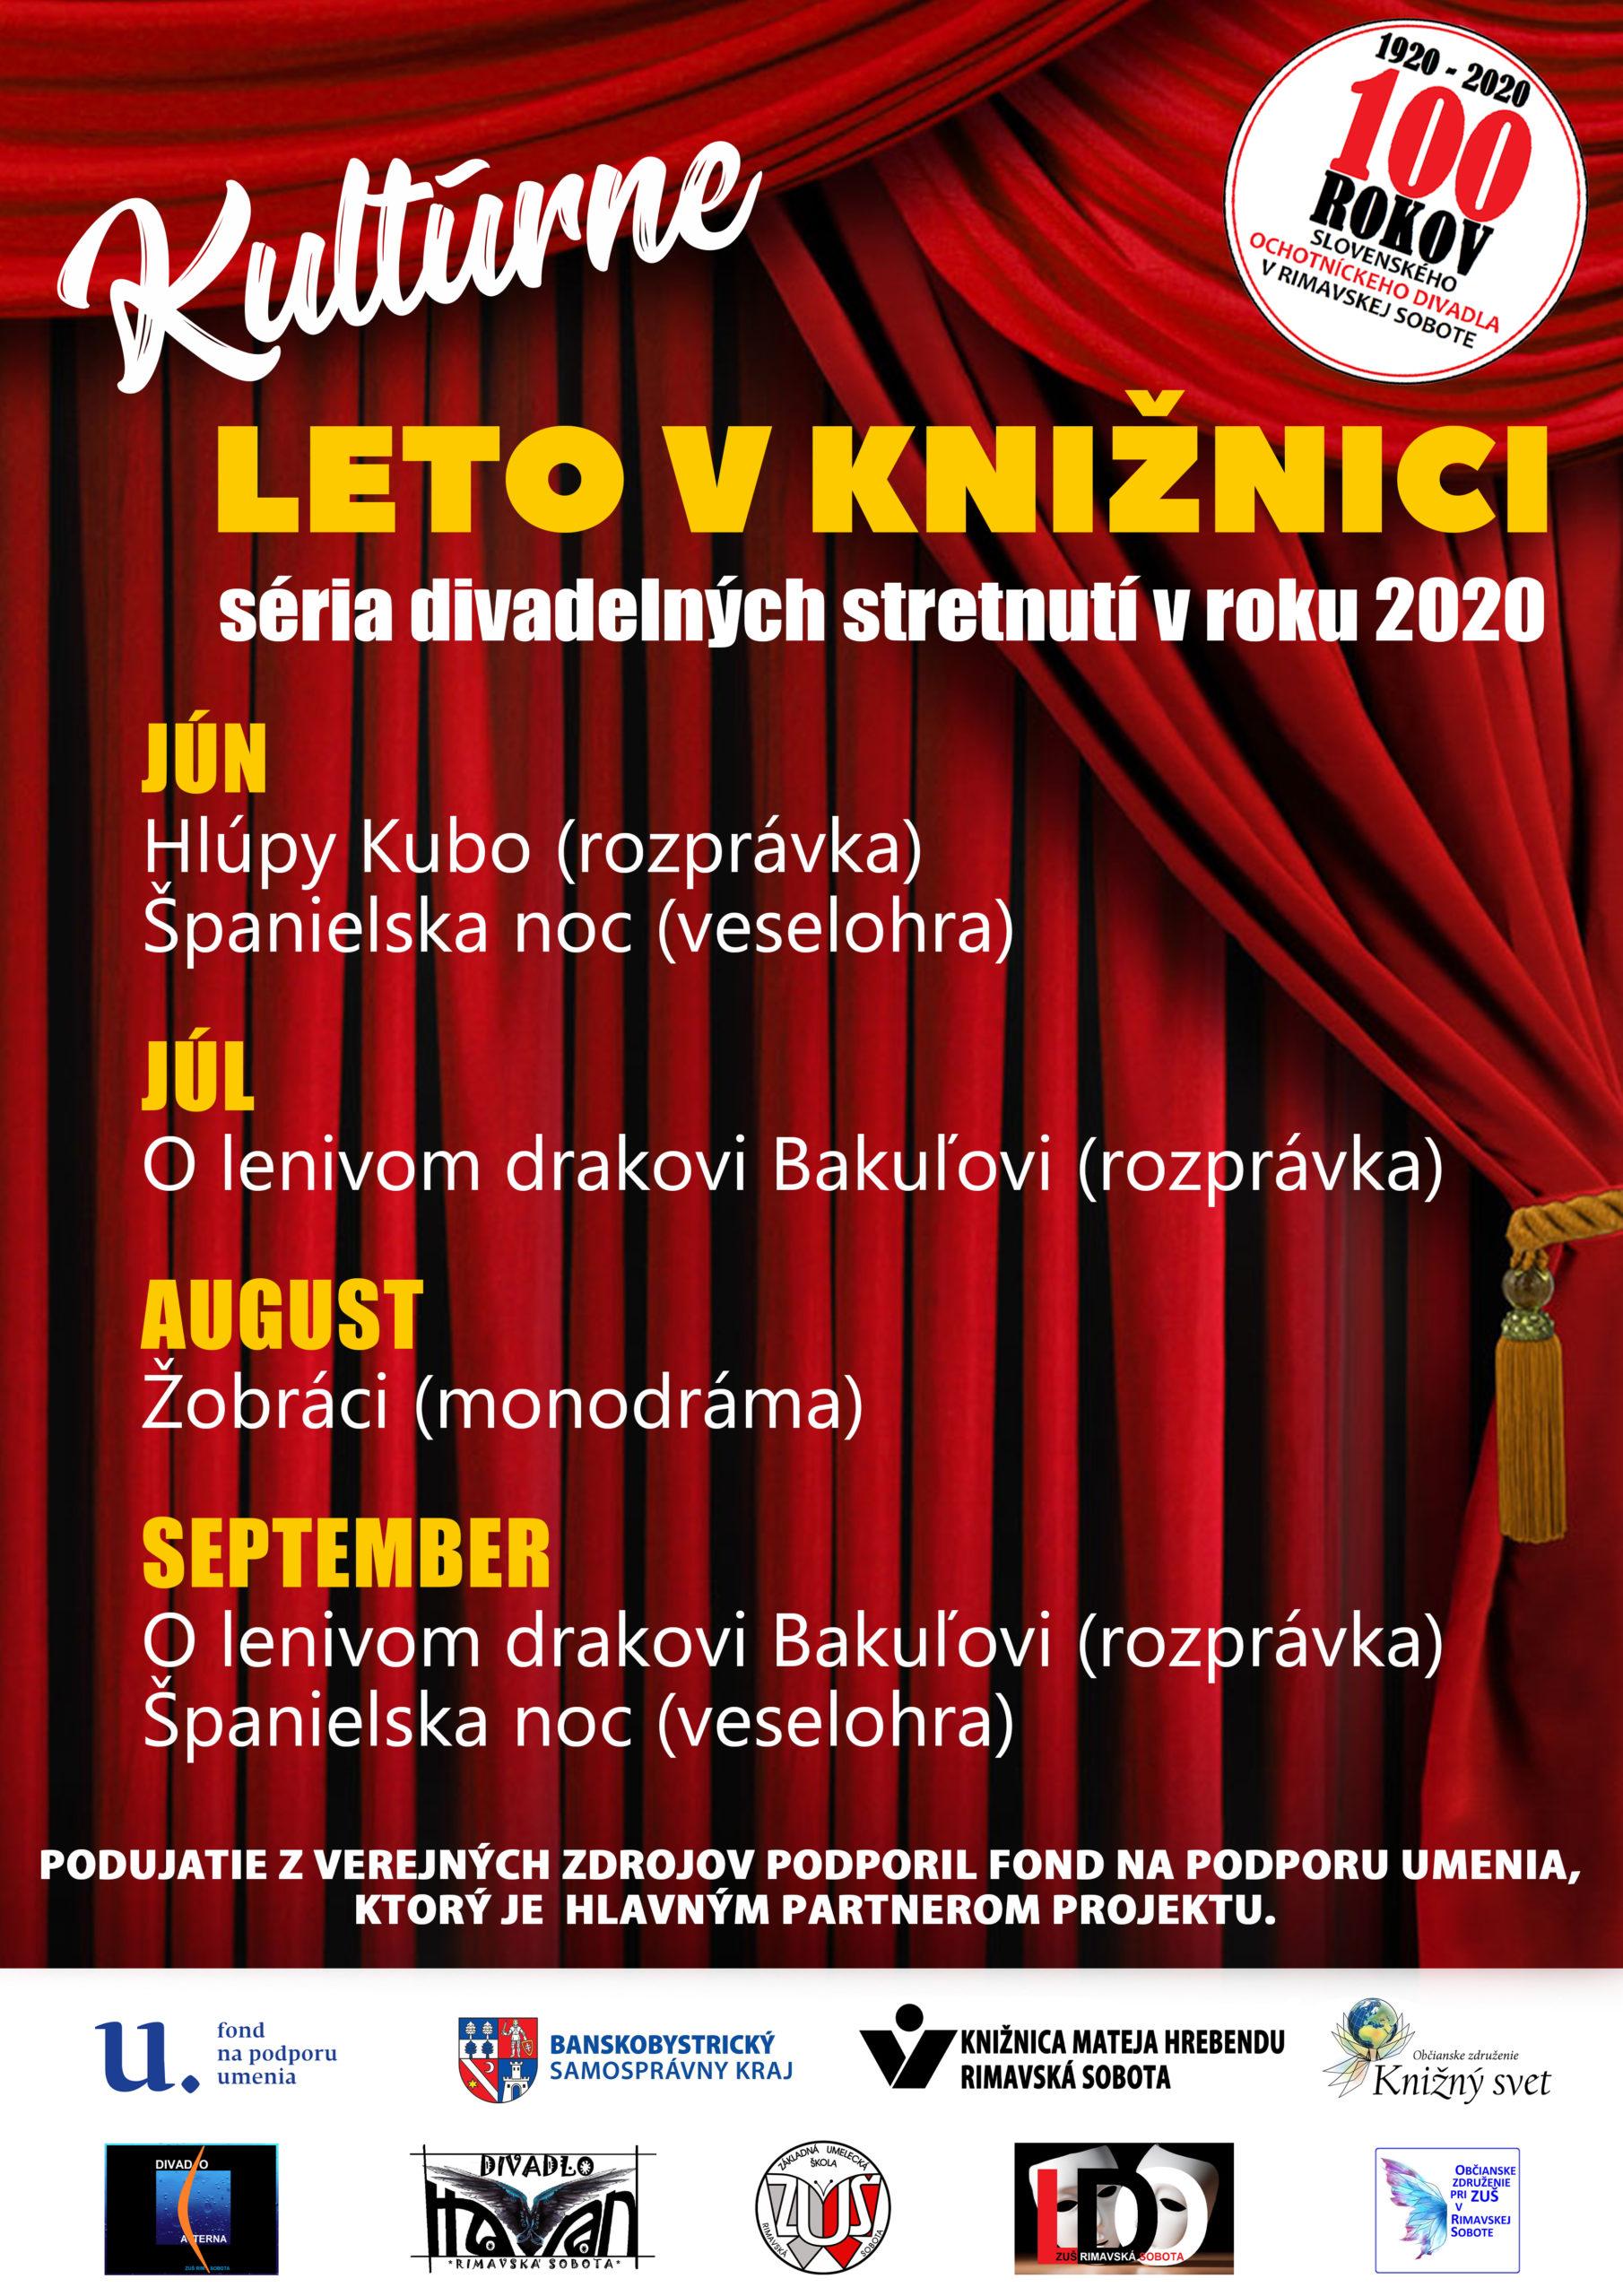 Kultúrne leto v knižnici @ Knižnica Mateja Hrebendu, FPU, BBSK